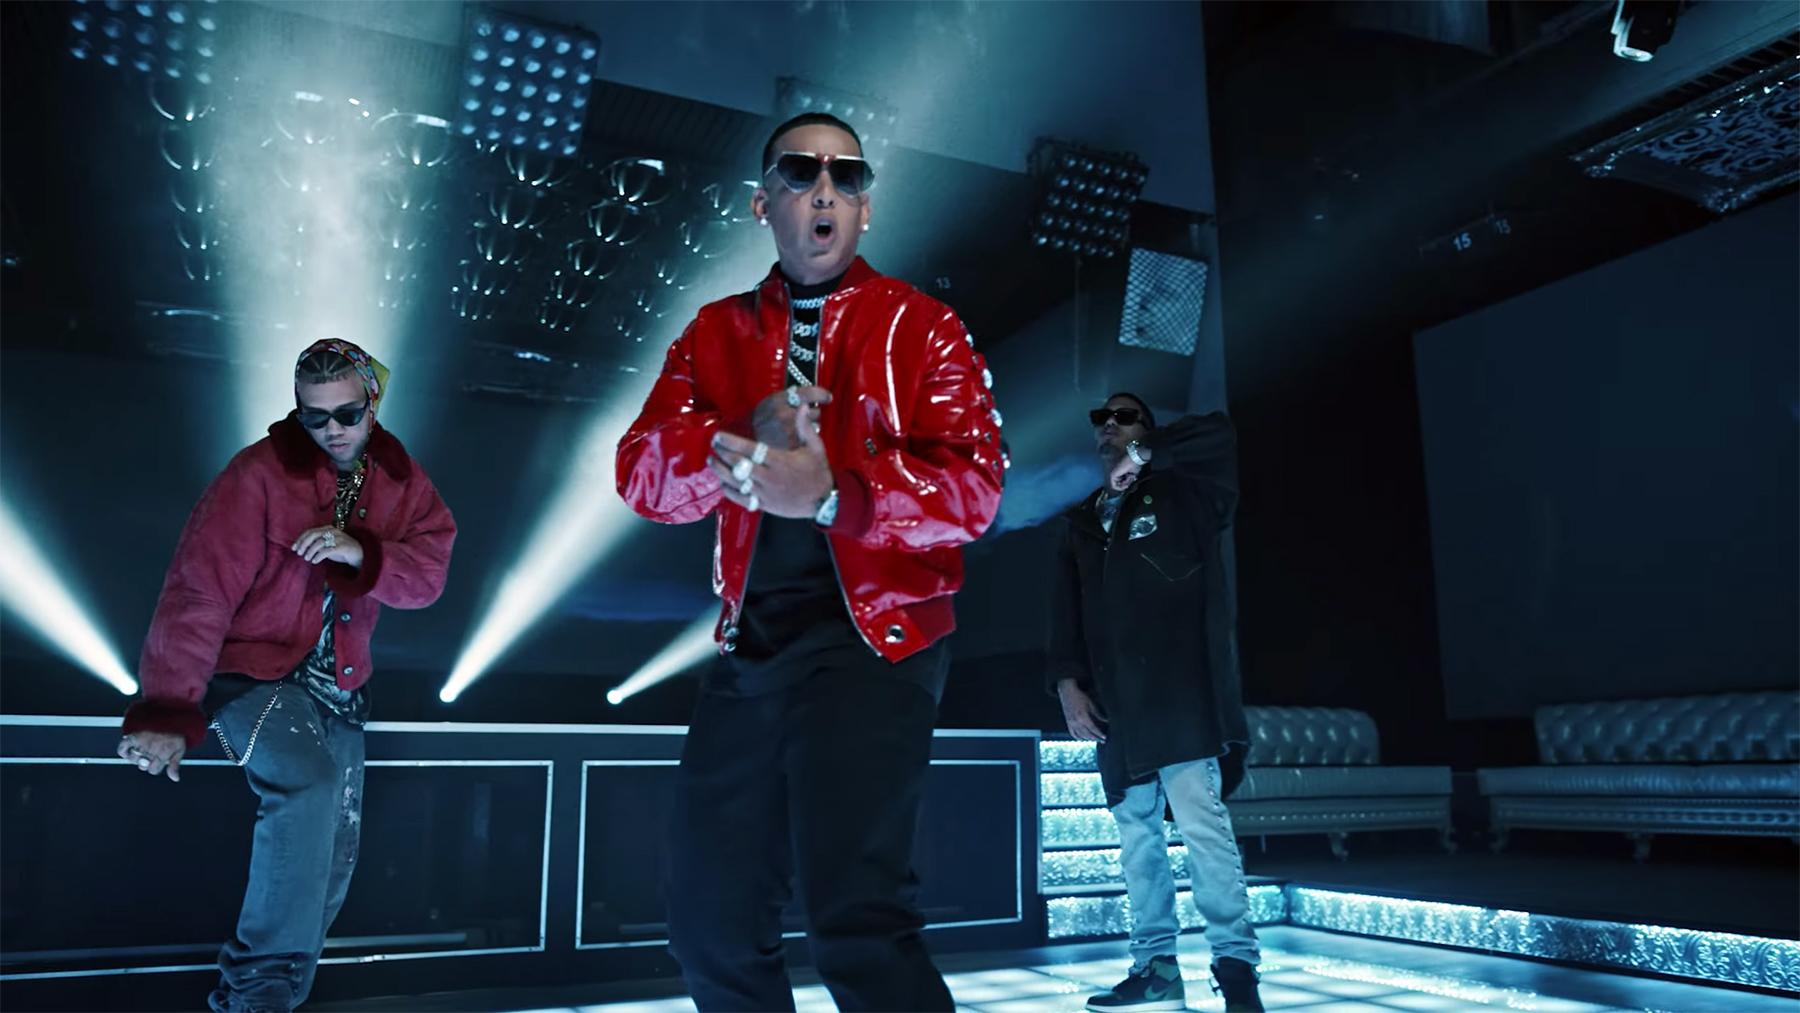 Daddy Yankee, Myke Towers, and Jhay Cortez Party in a Vampire Underworld on Surprise Track 'Súbele El Volumen'